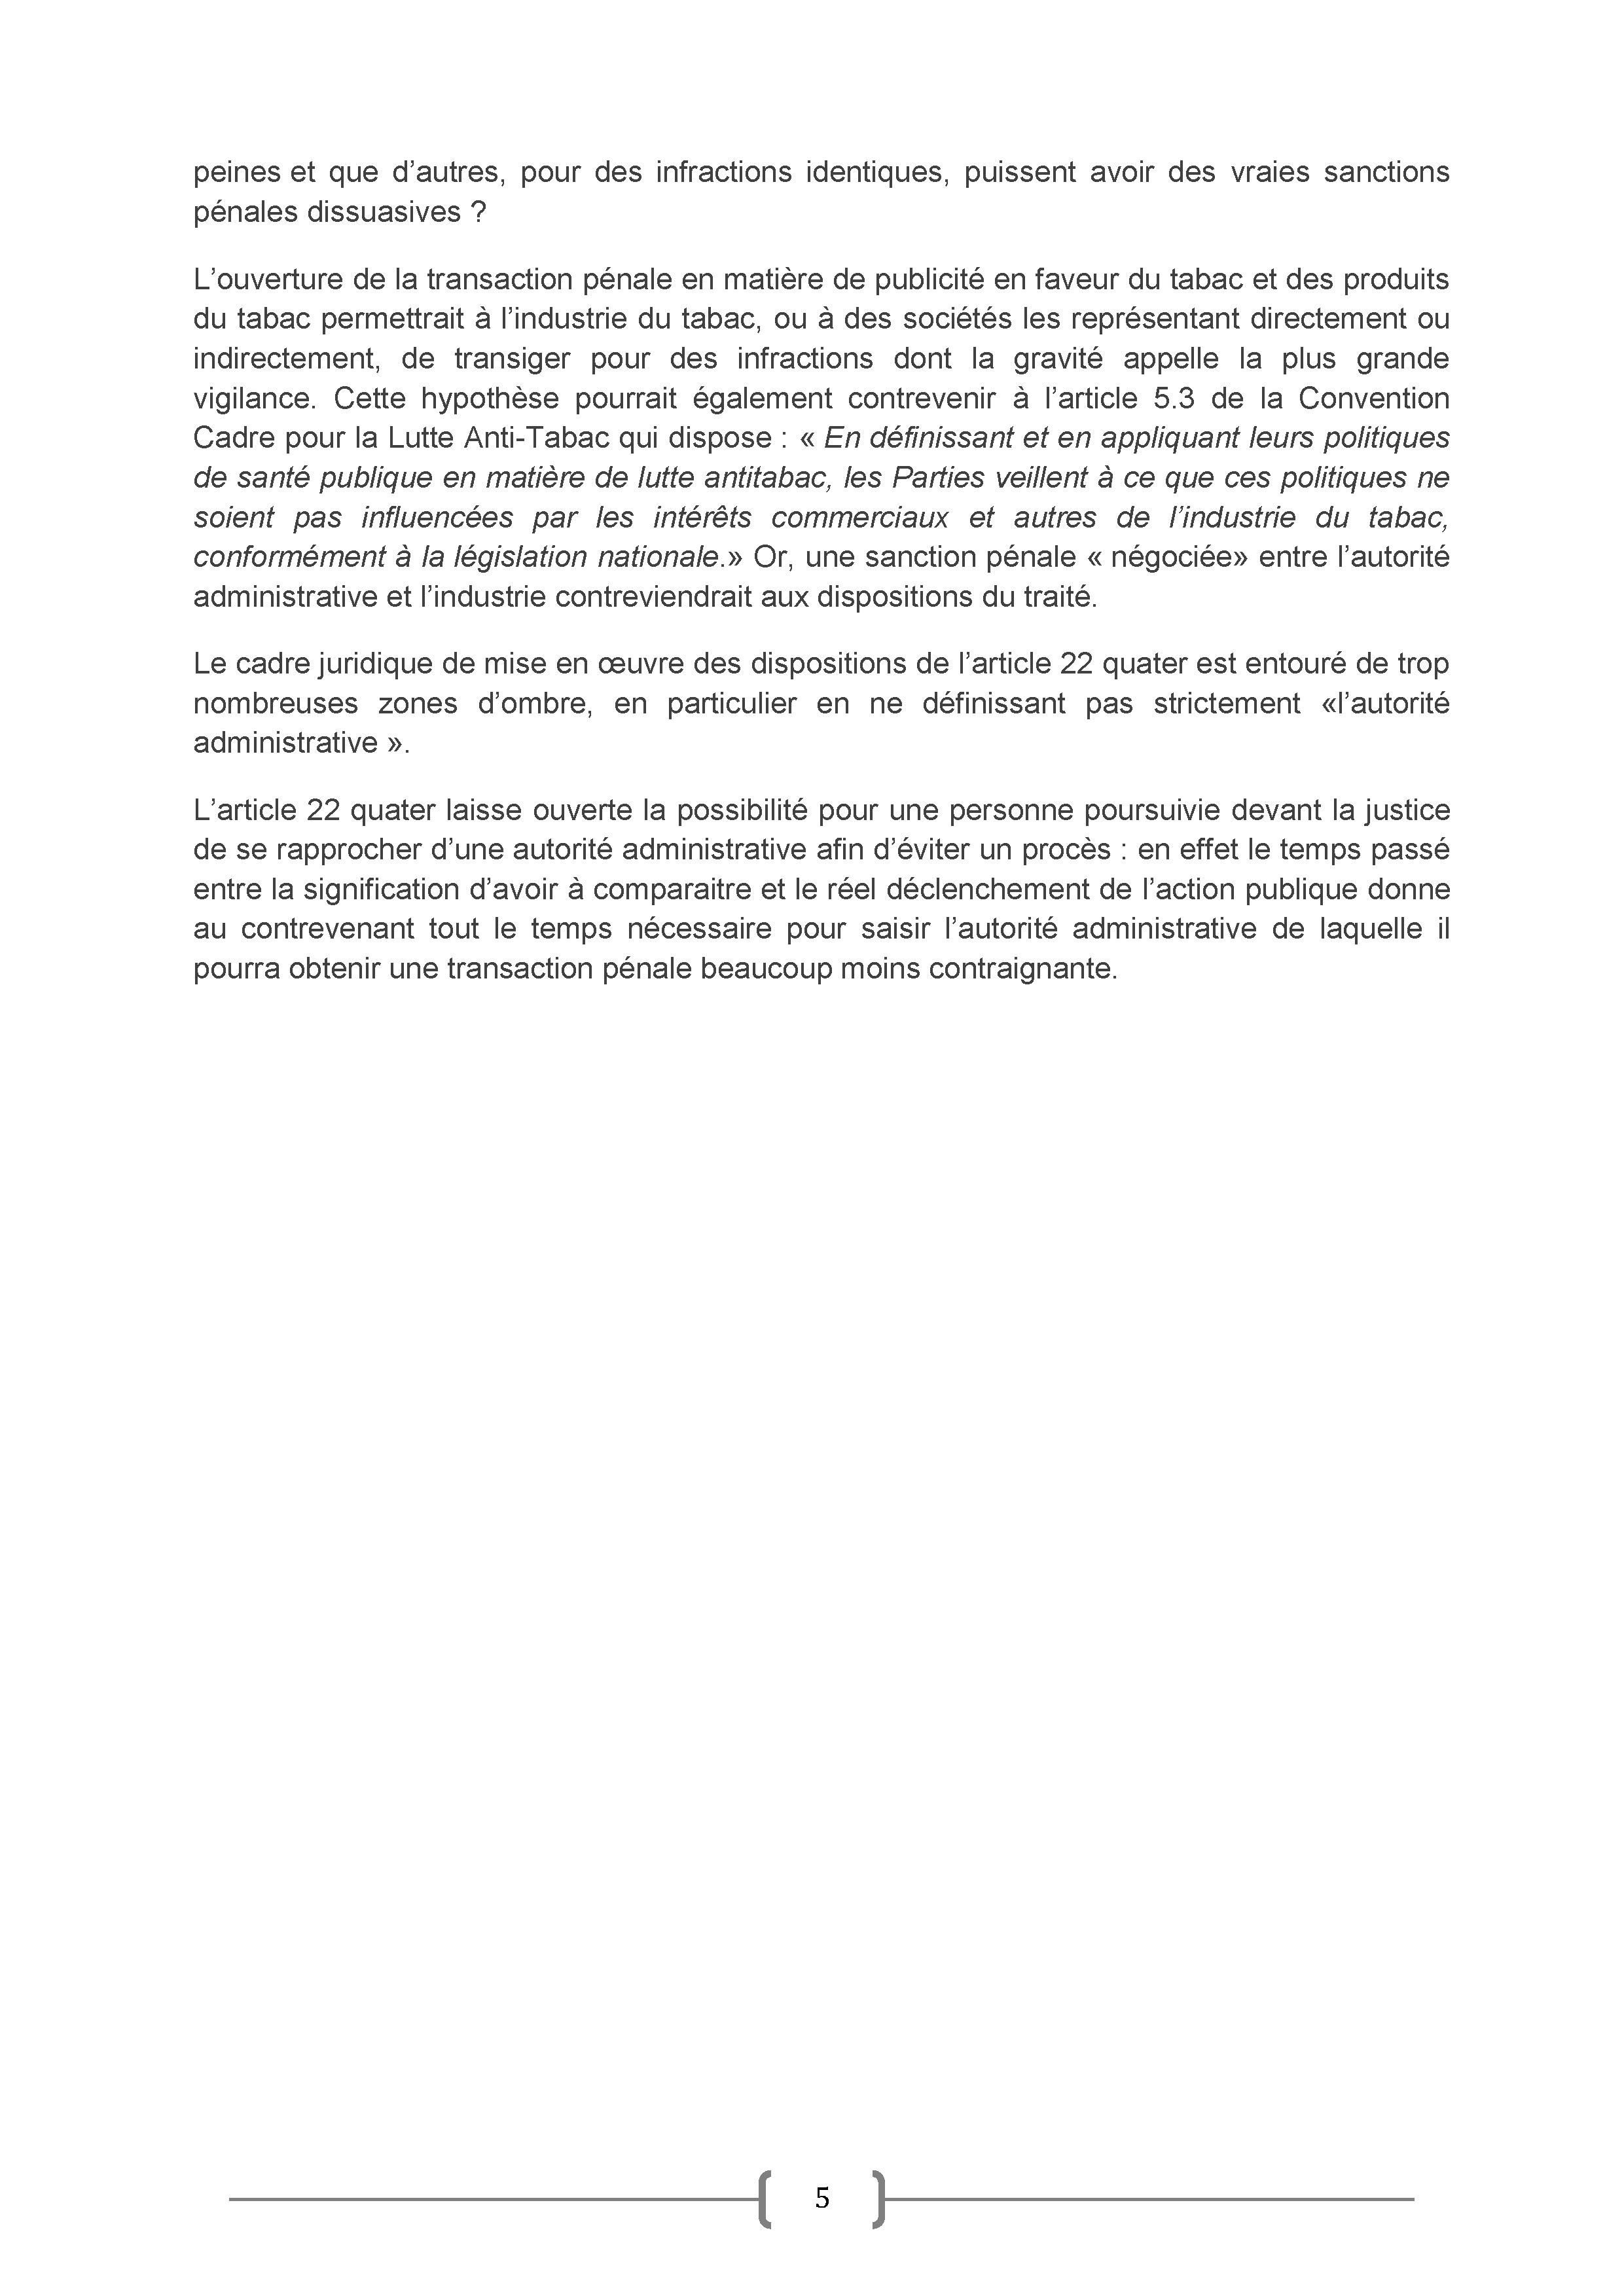 Alliance-DP_projet-loi-article-22-quater_05juil2011_Page_5.jpg